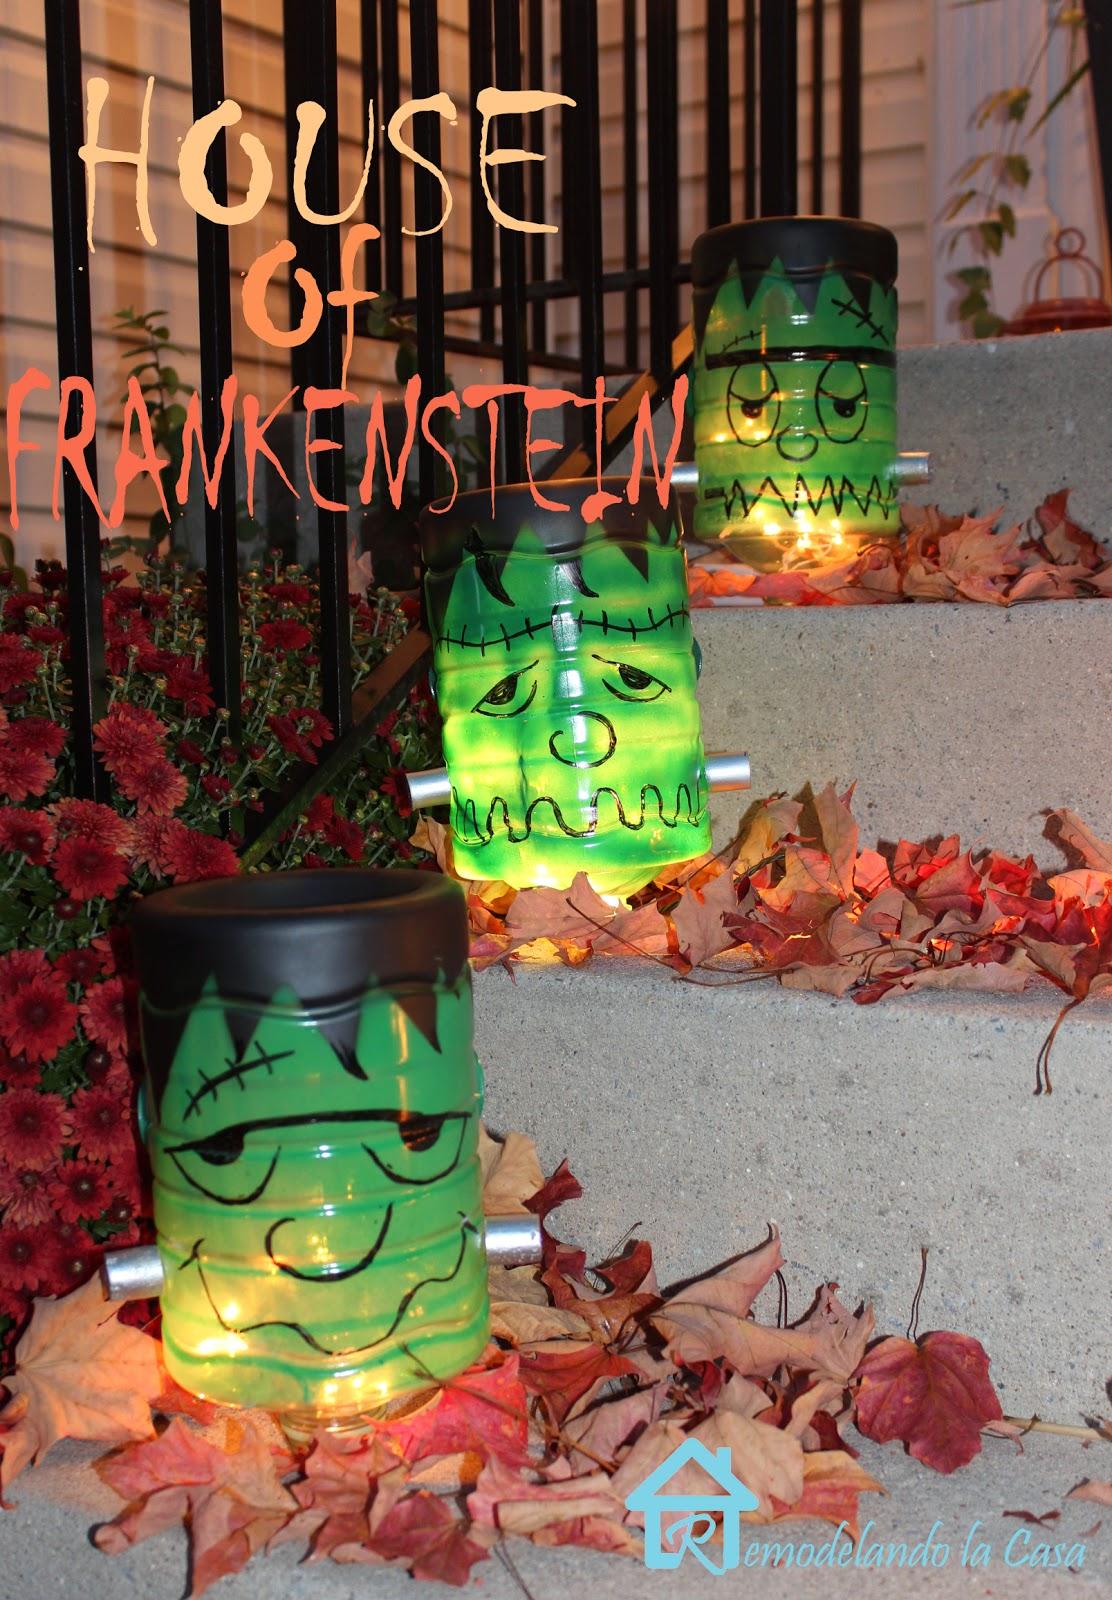 Frankenstein Decorations for Halloween Remodelando la Casa